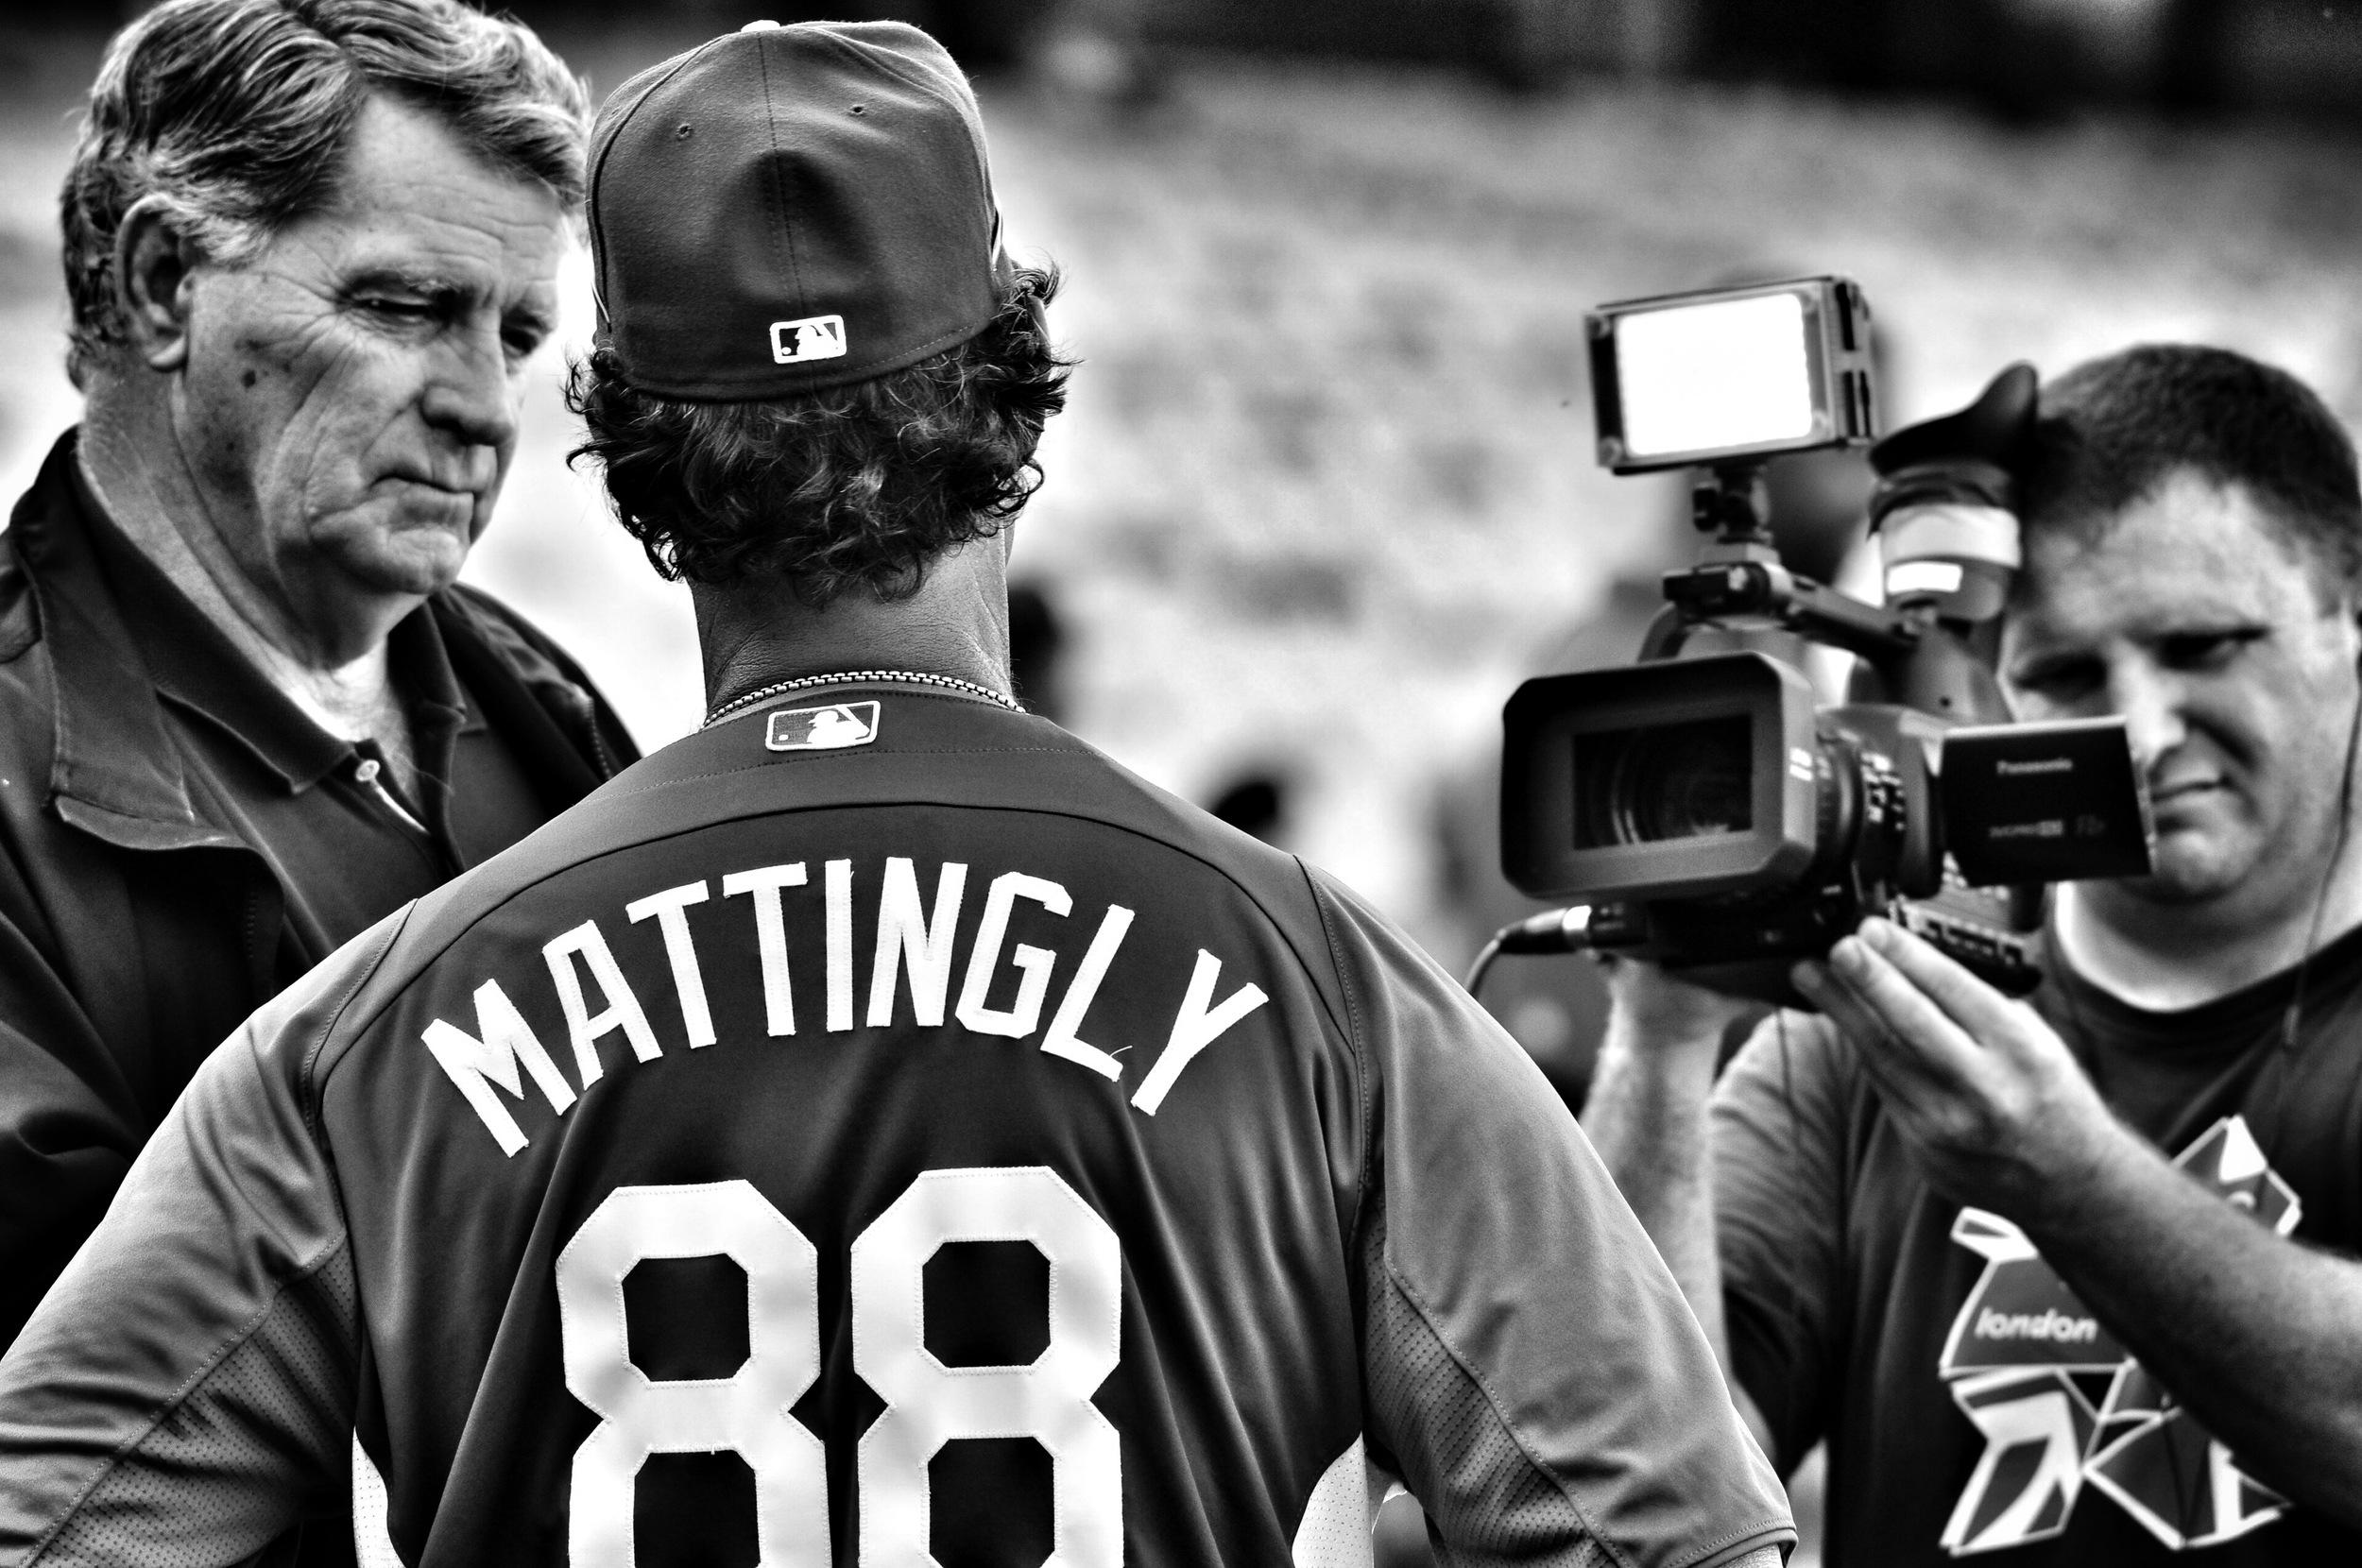 MATTINGLY AND MEDIA2.JPG